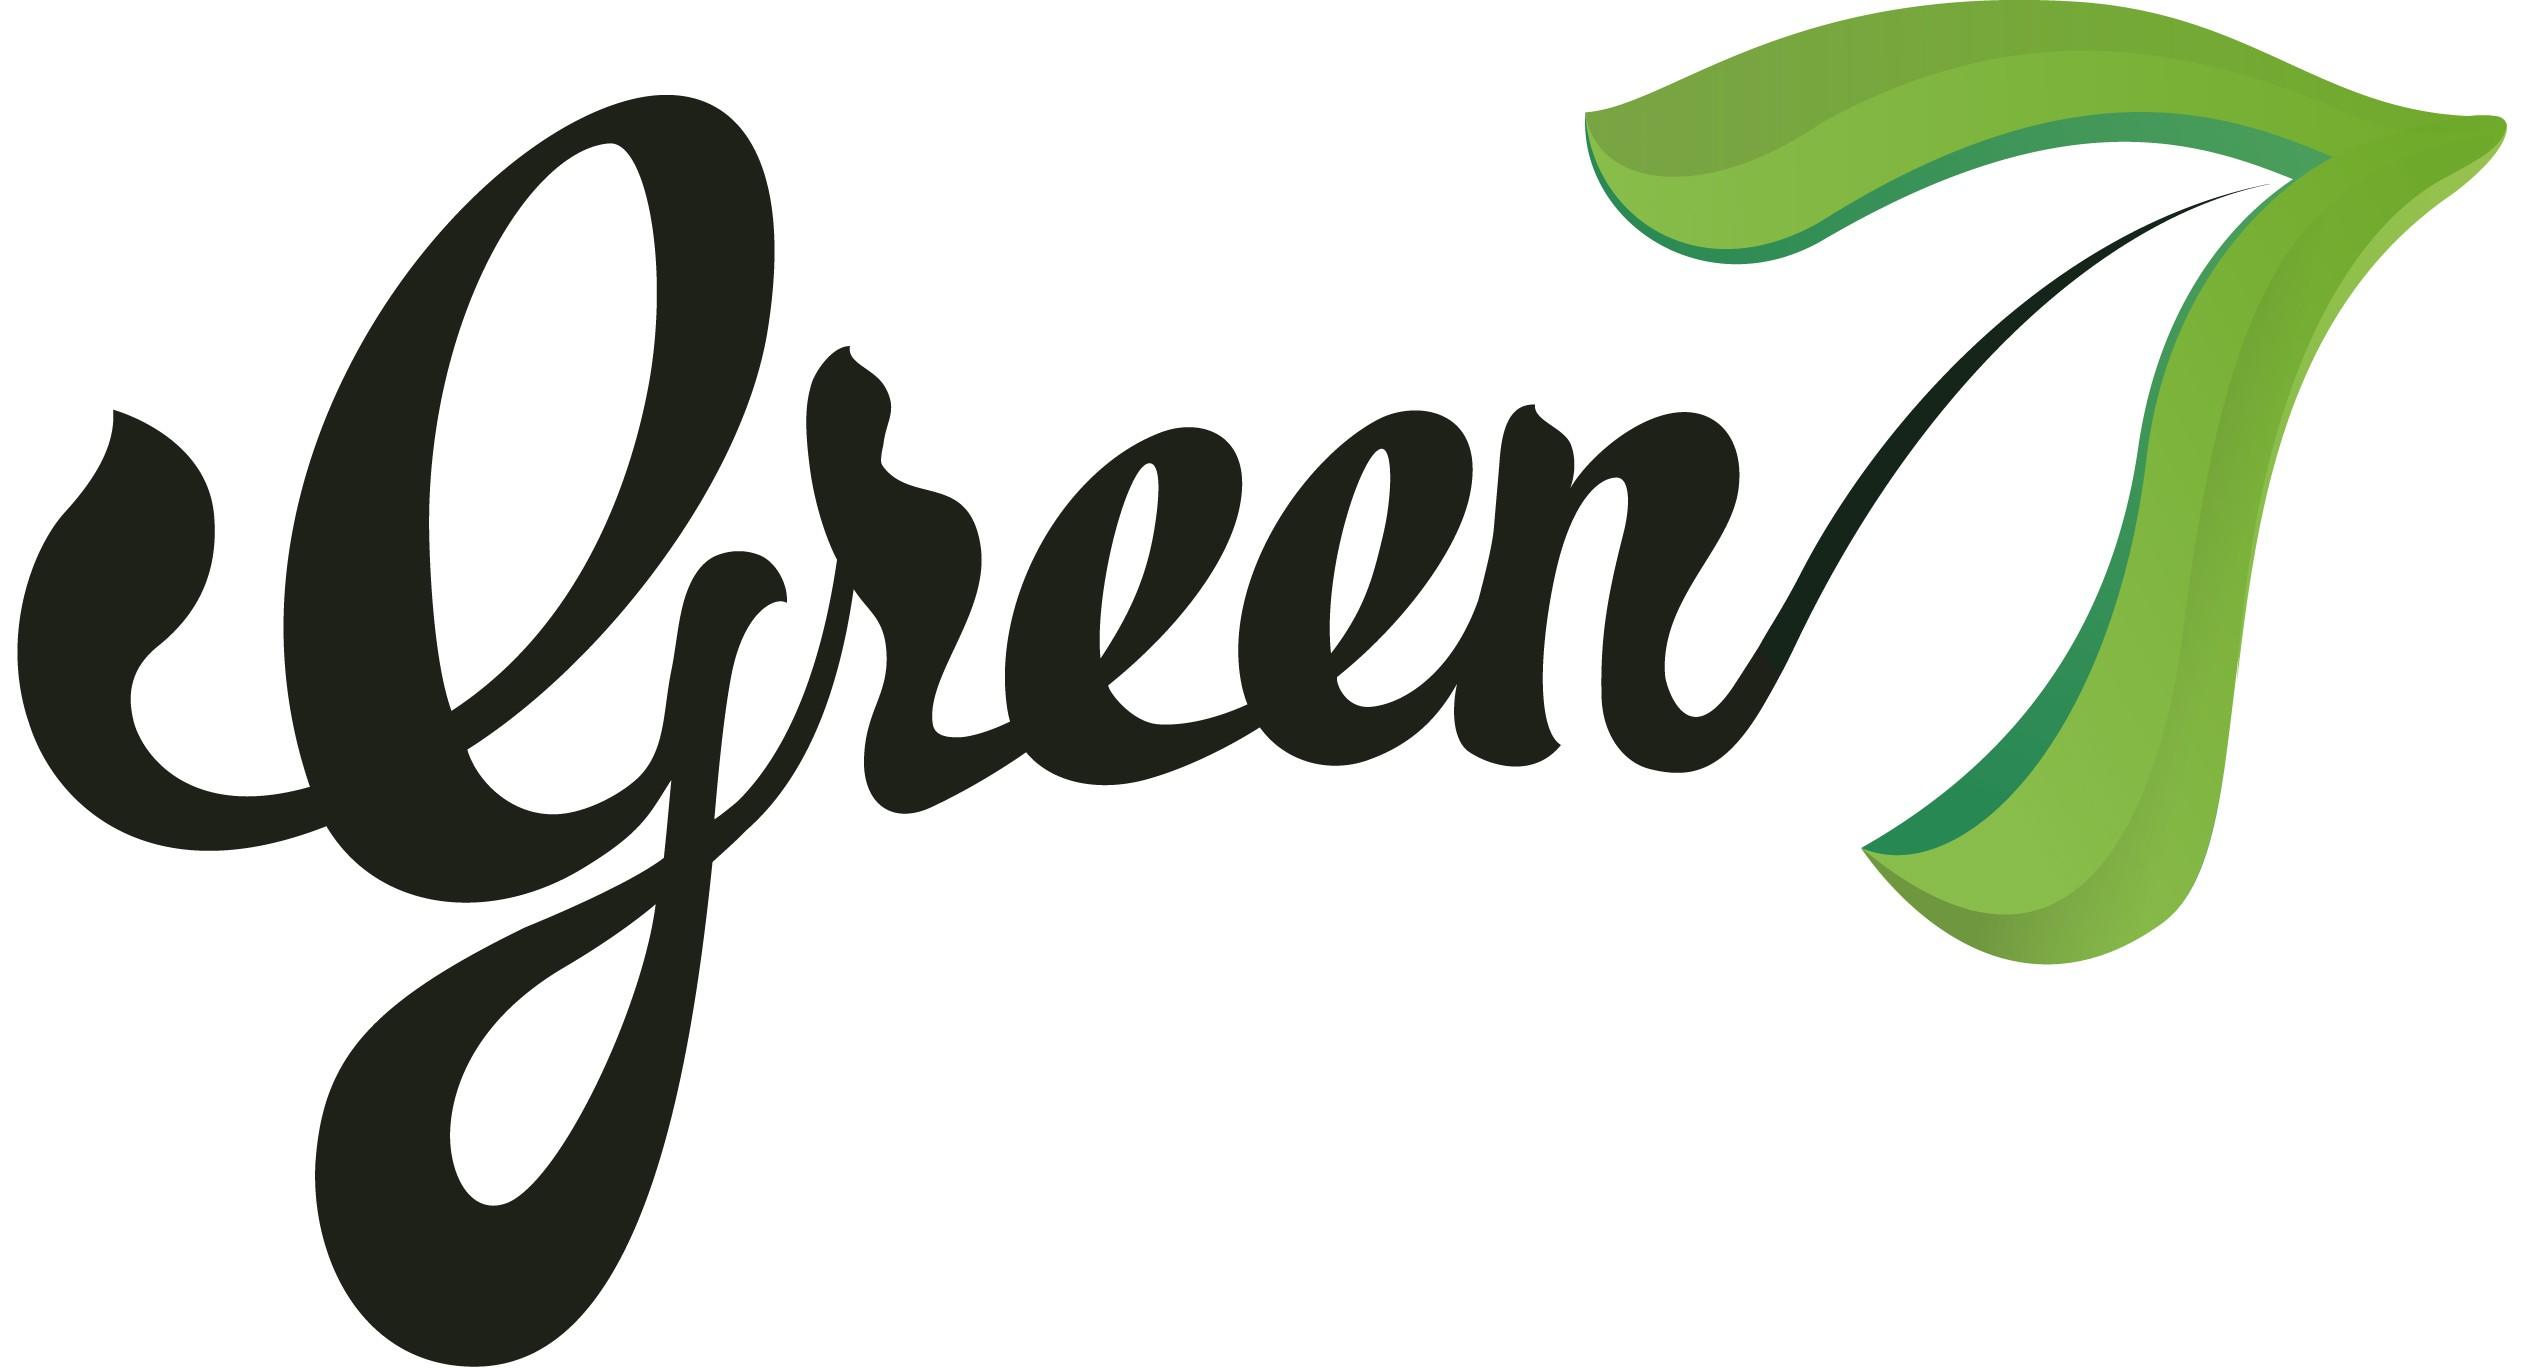 Green 7 - Novatech